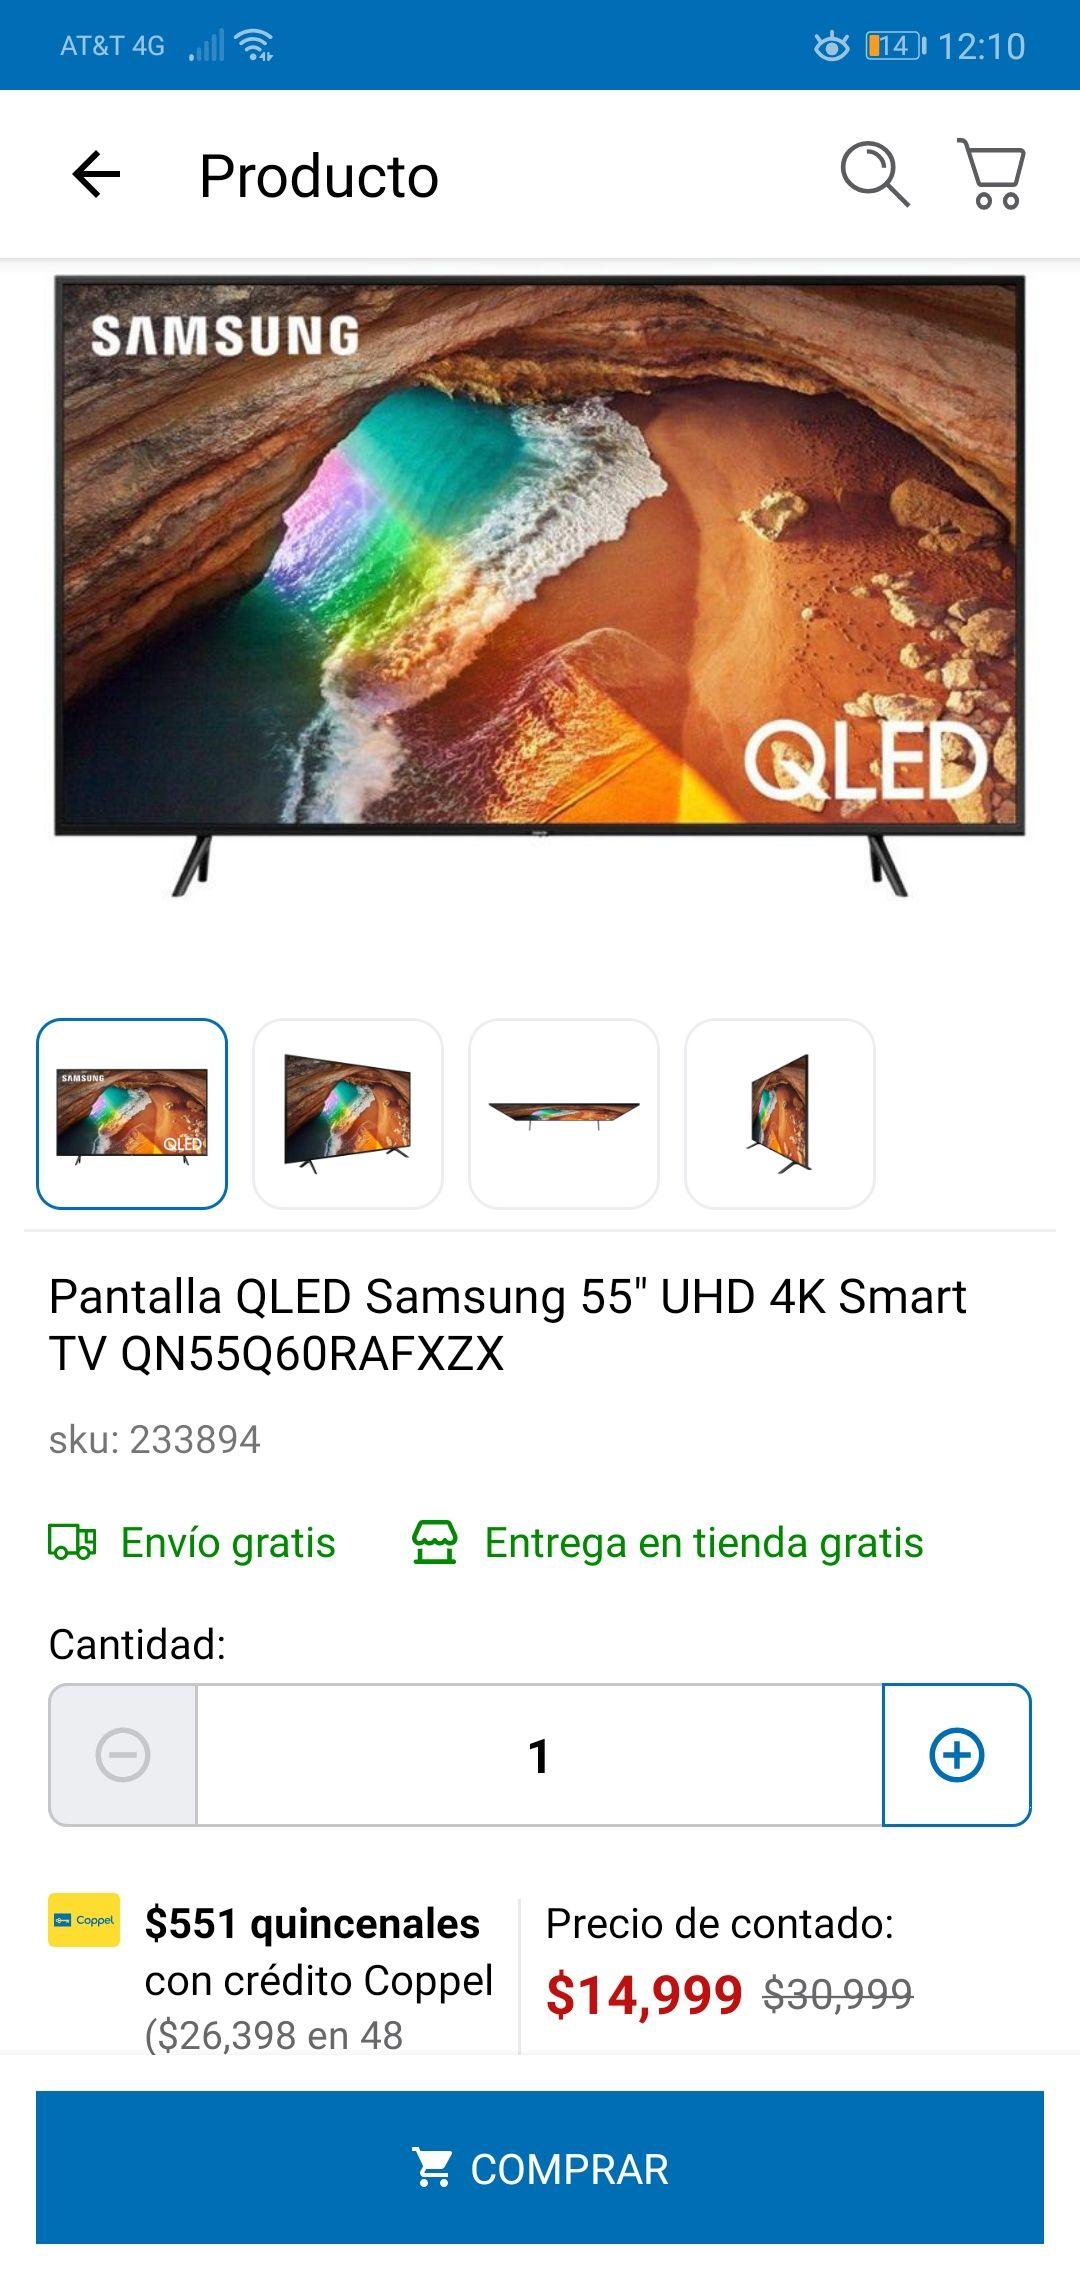 Coppel: Samsung smartv QN55Q60RAFXZX